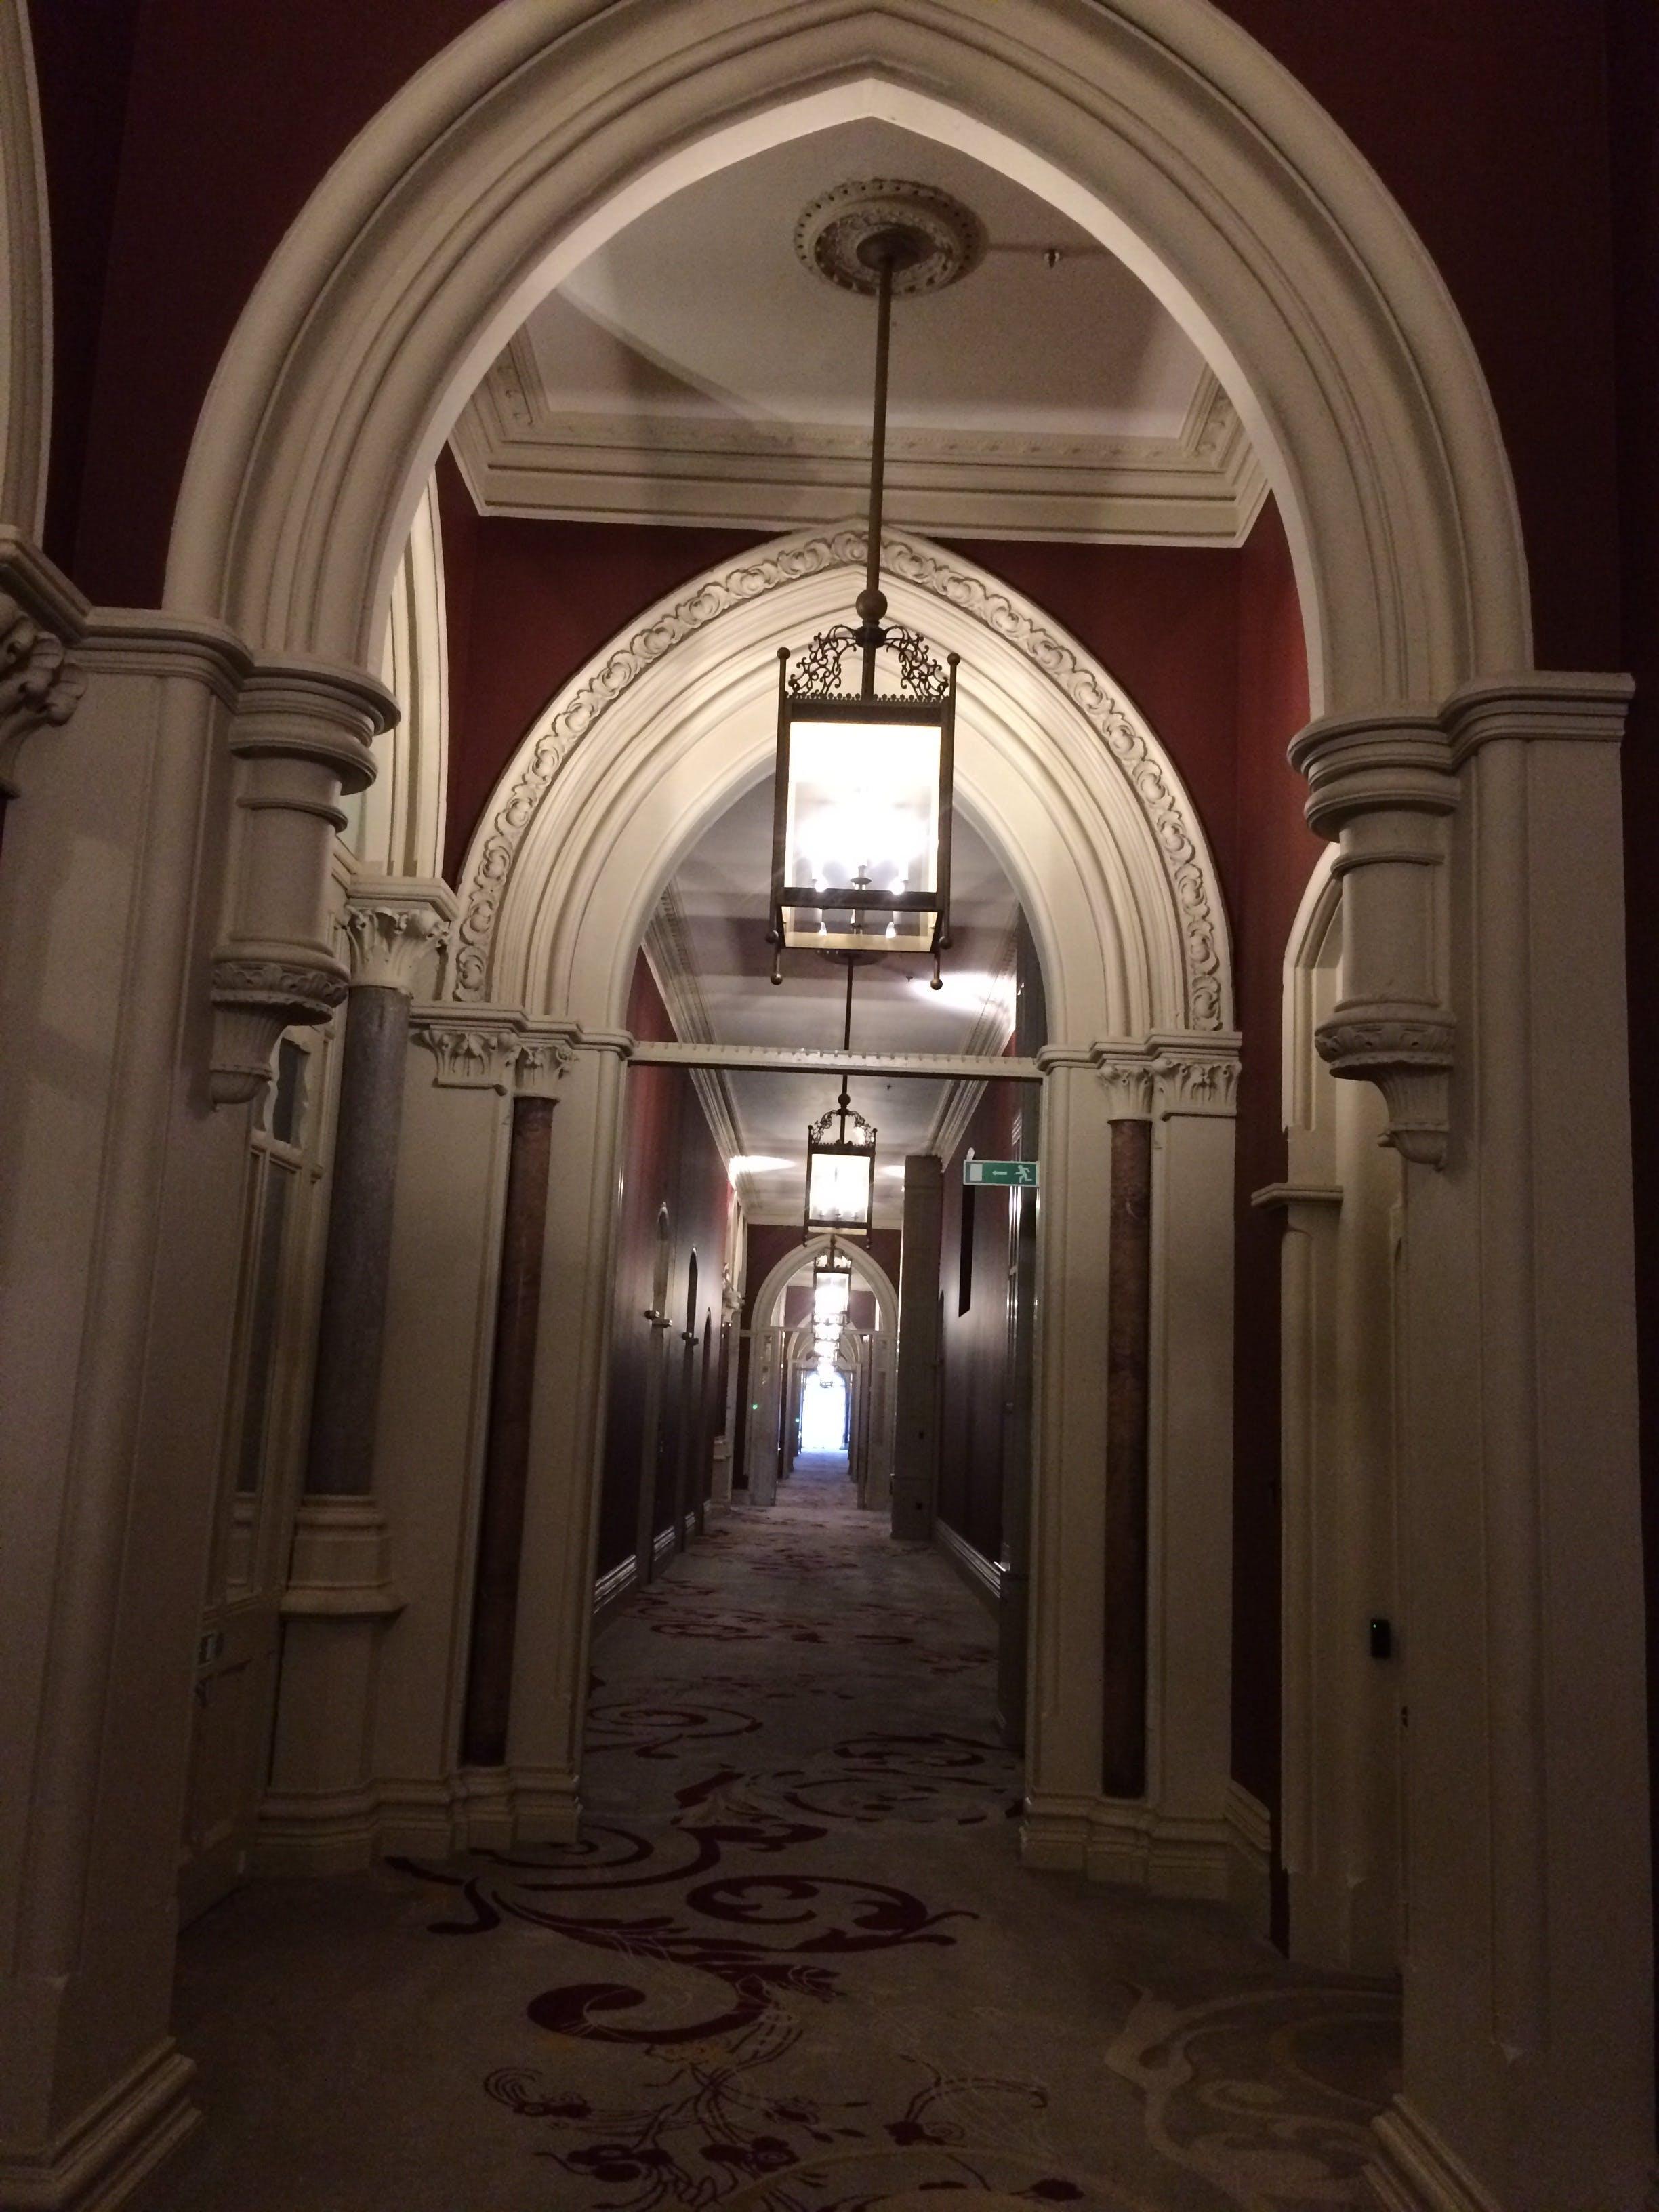 Free stock photo of St Pancras Hotel  corridor